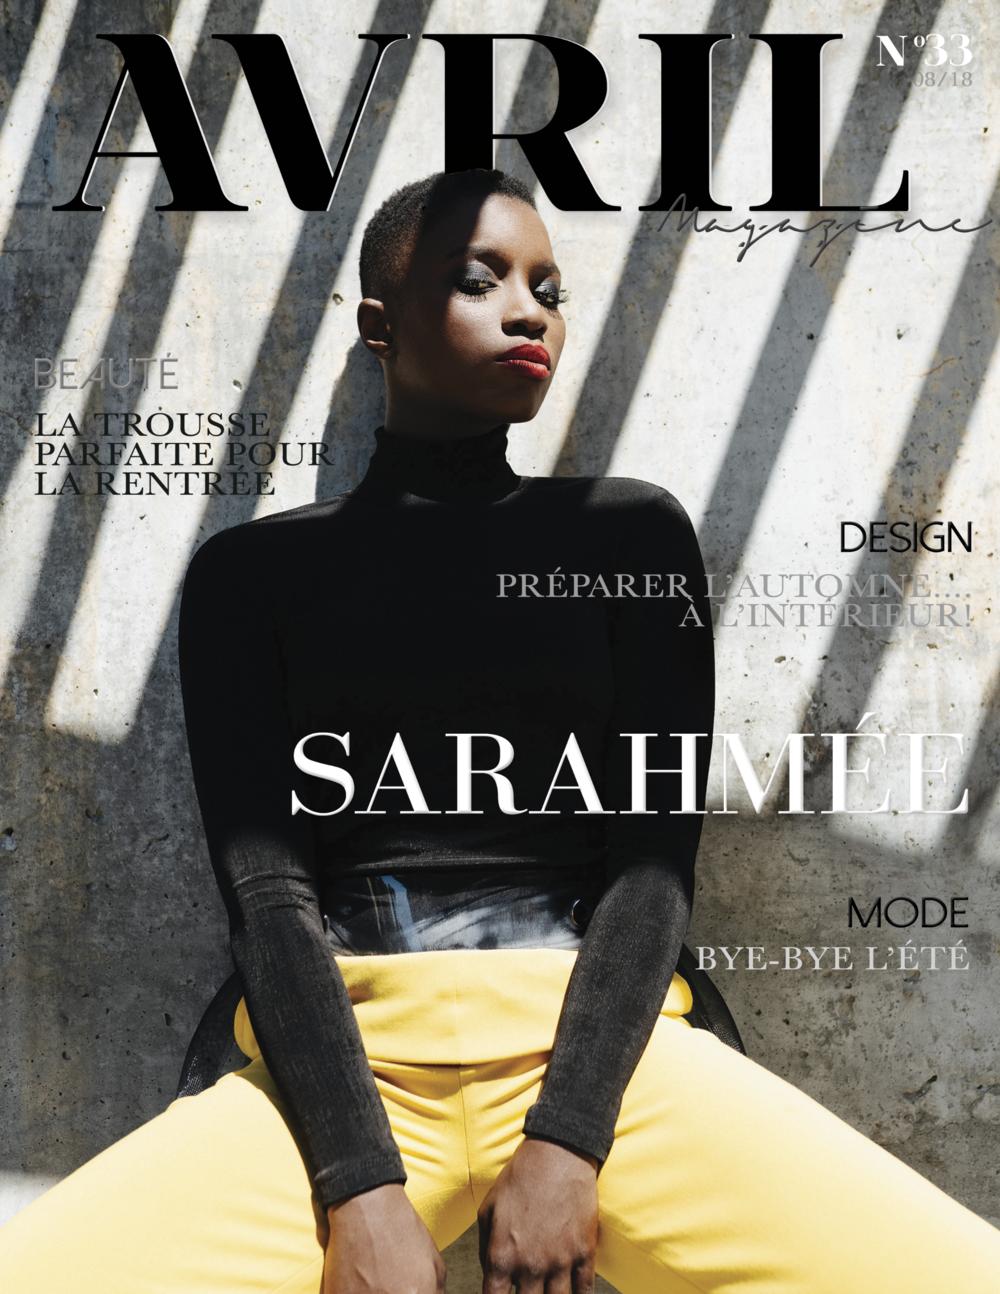 📸Avril Franco  Styliste : Justine Gagnon | @ju_lapulguita  Maquillage : Woodly Elan | @woodlyelan  Vêtements : Guillaume Delisle | @delisle_design